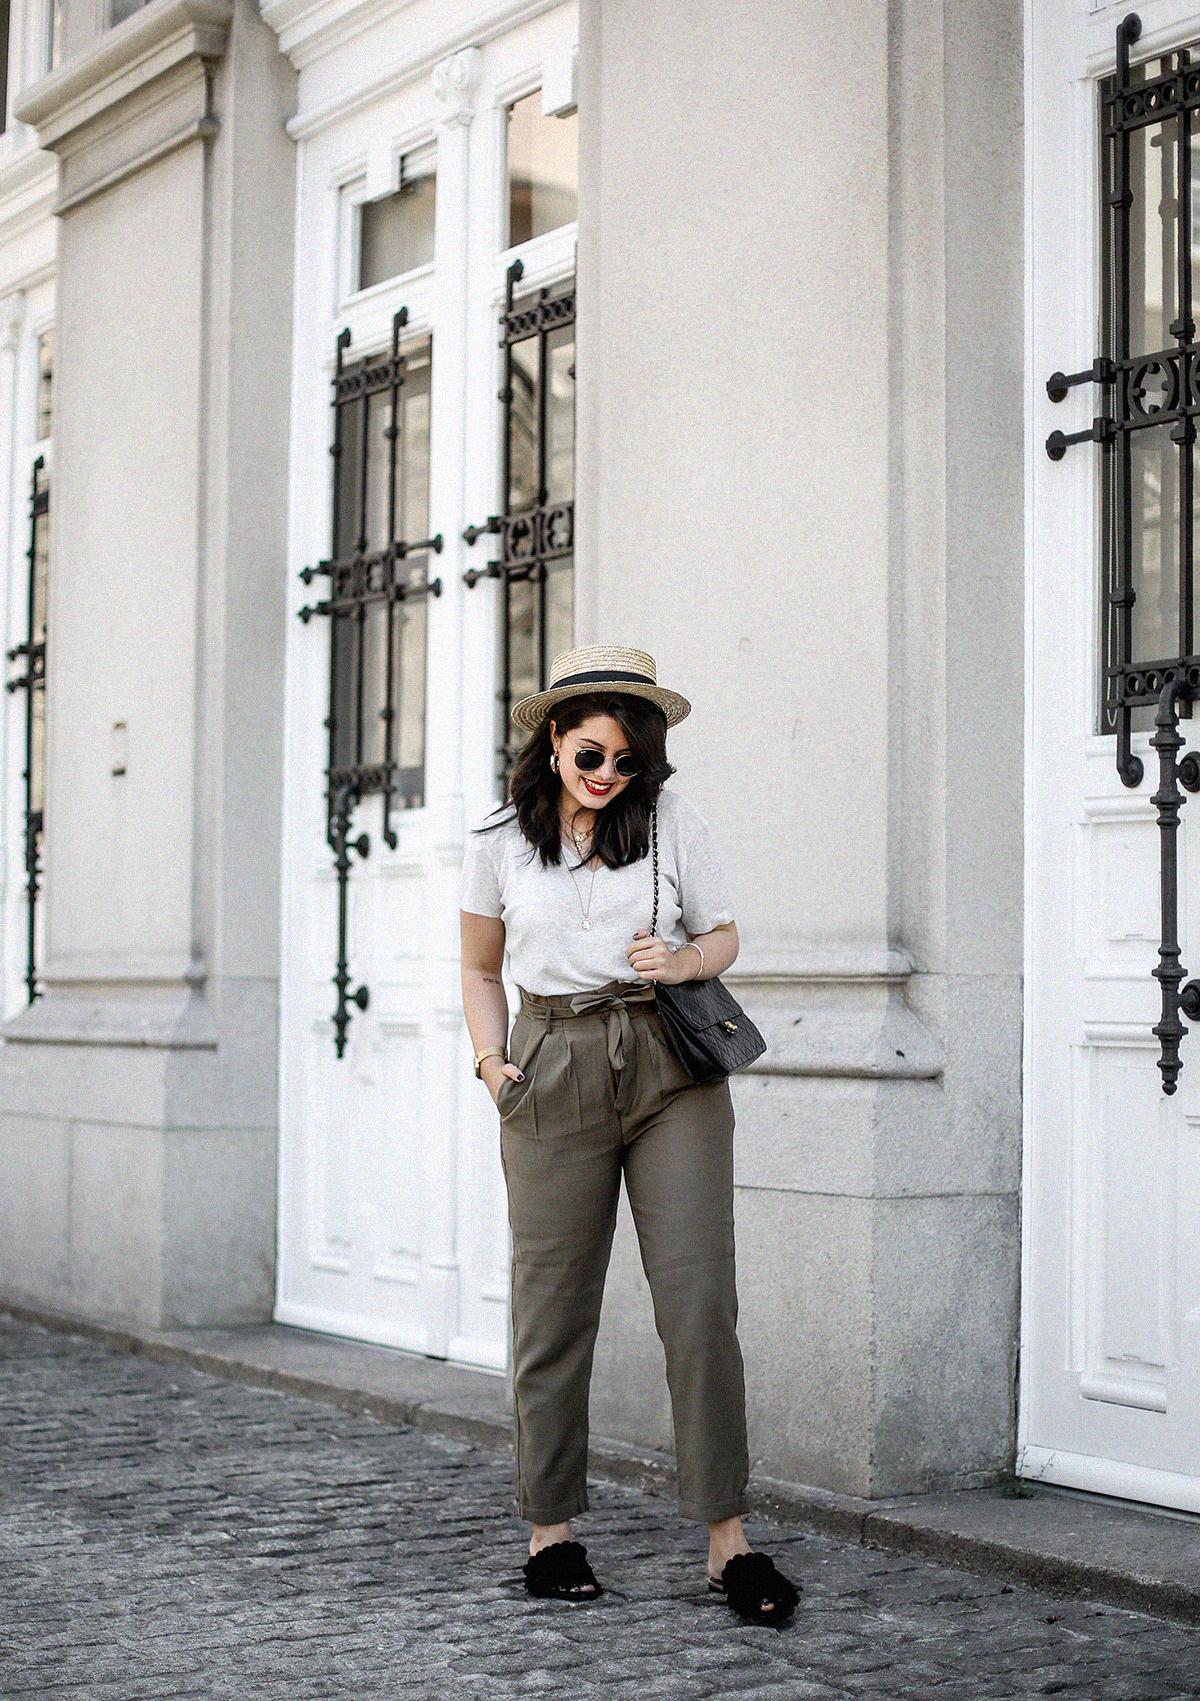 pantalones-verdes-altos-palas-borlas-zara-canotier-look-myblueberrynightsblog5